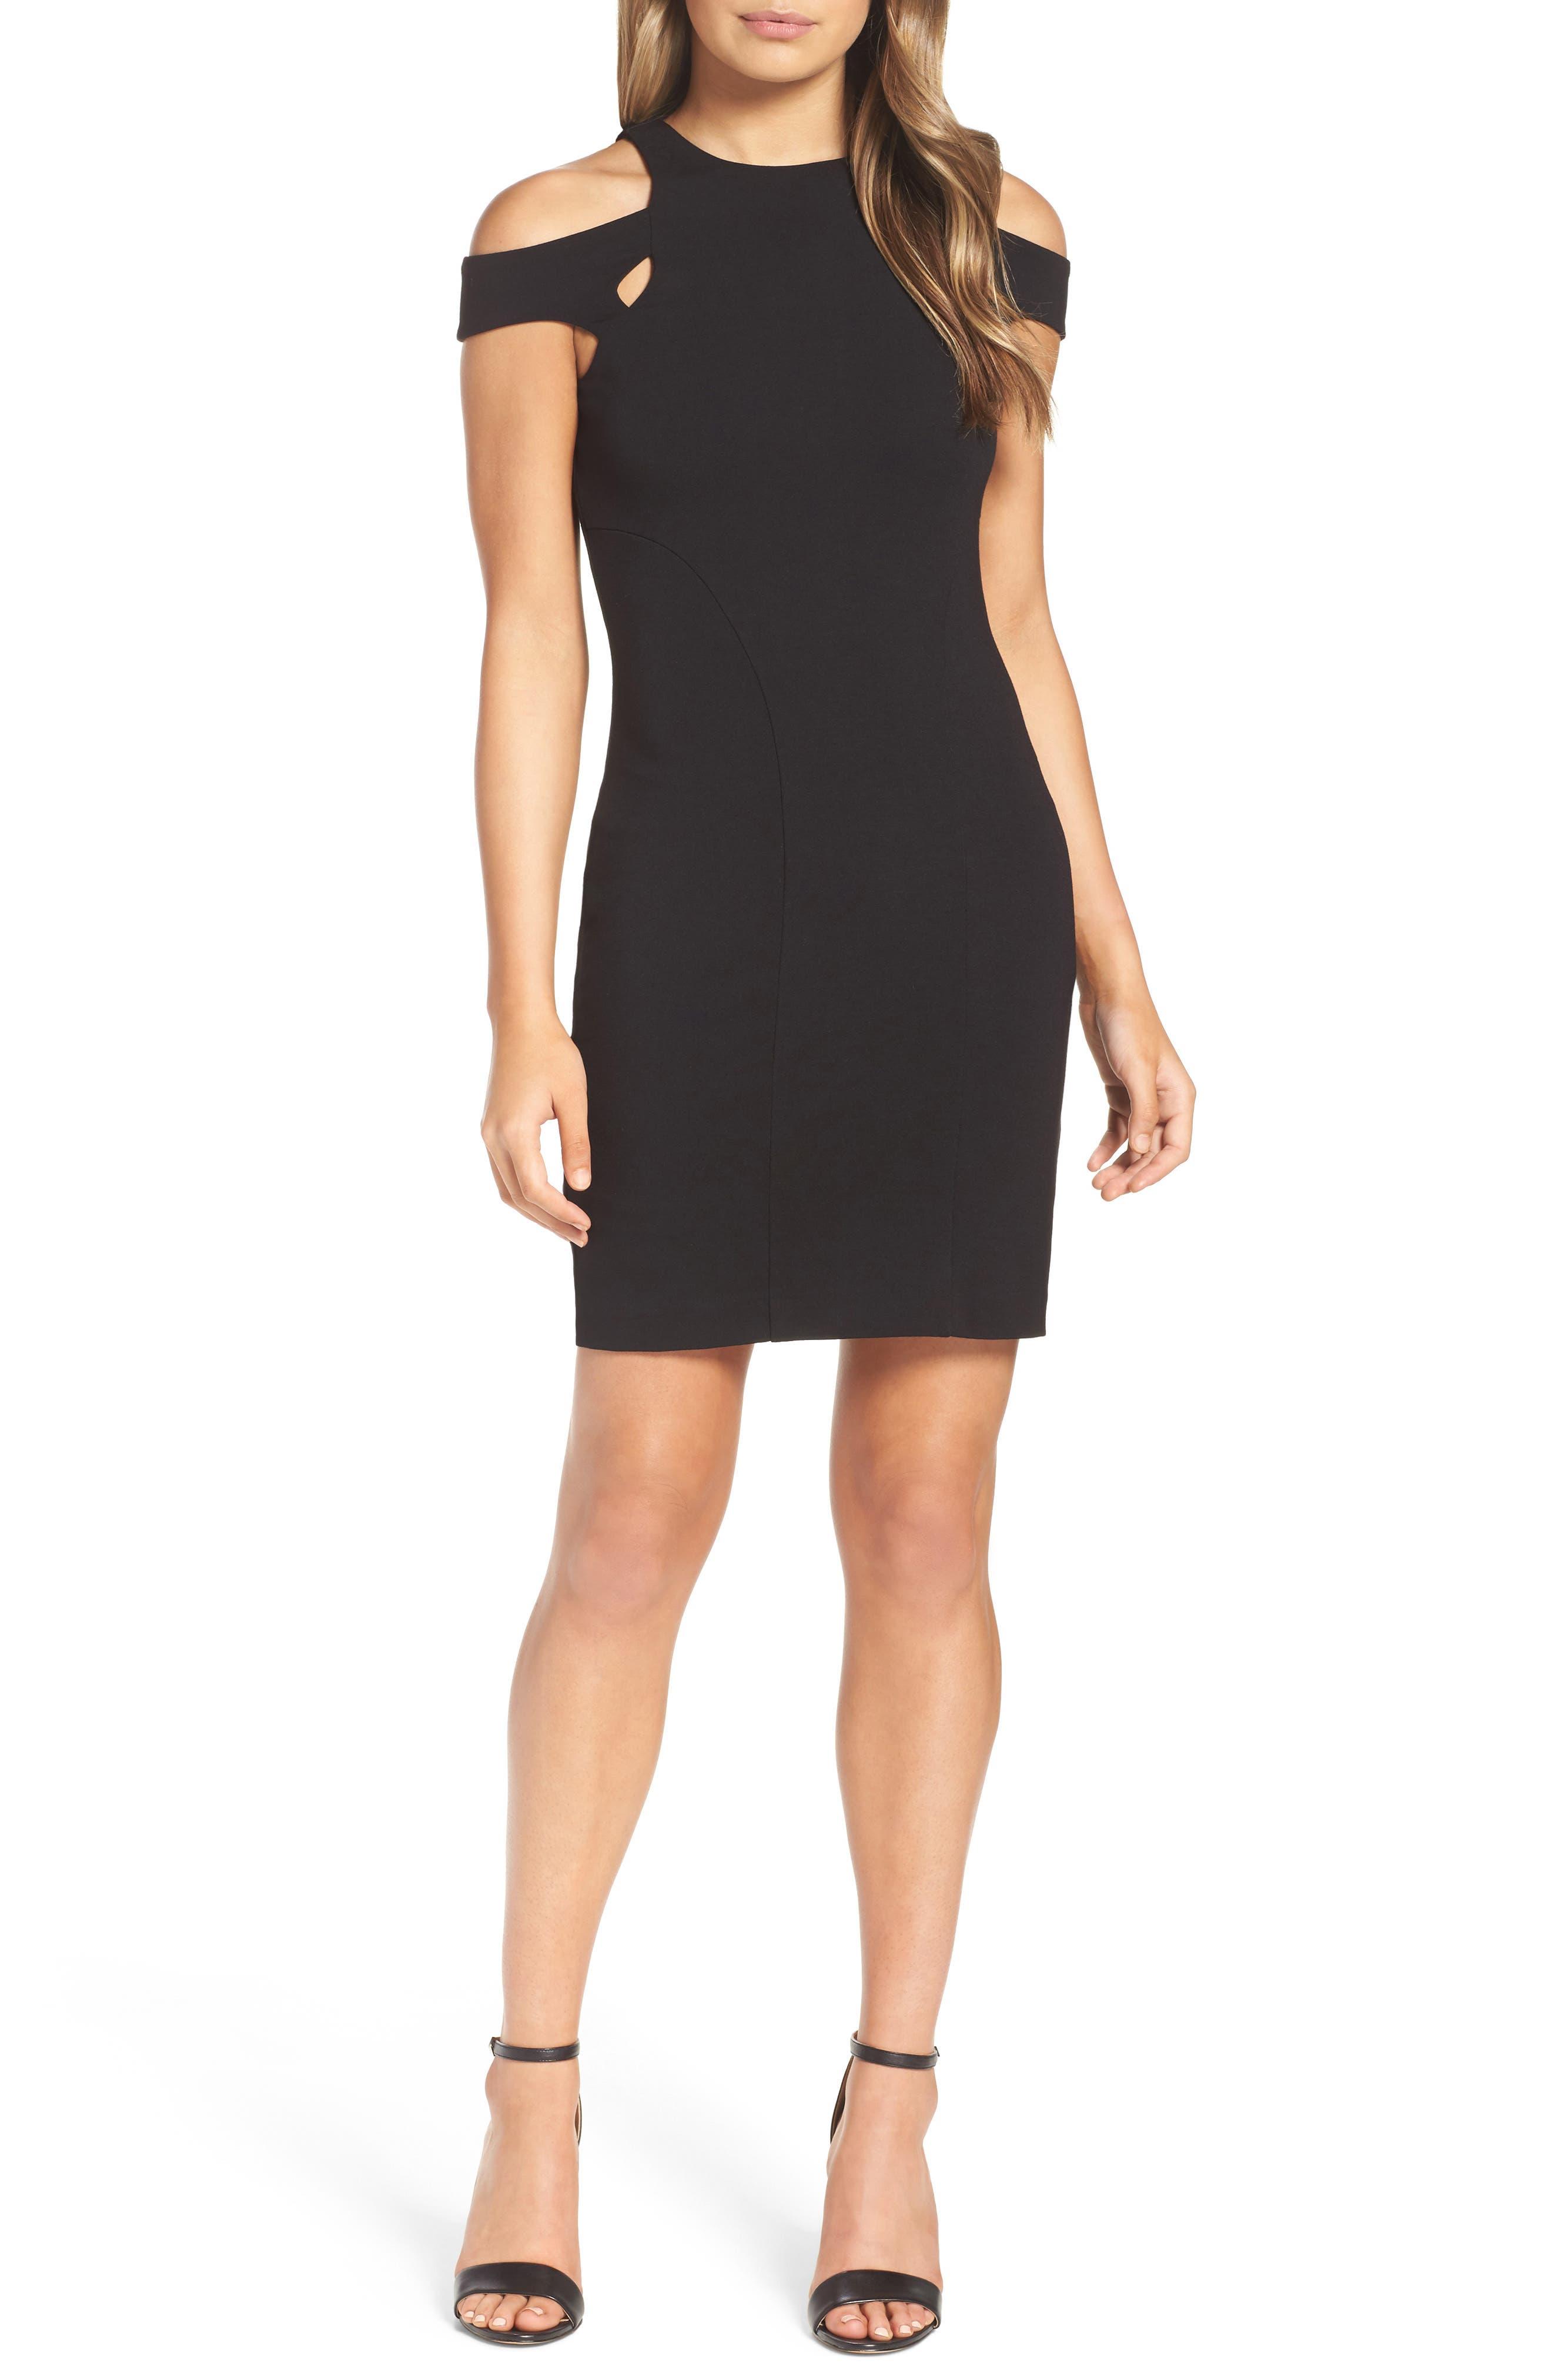 Muy Caliente Cold Shoulder Body-Con Dress,                         Main,                         color, Black